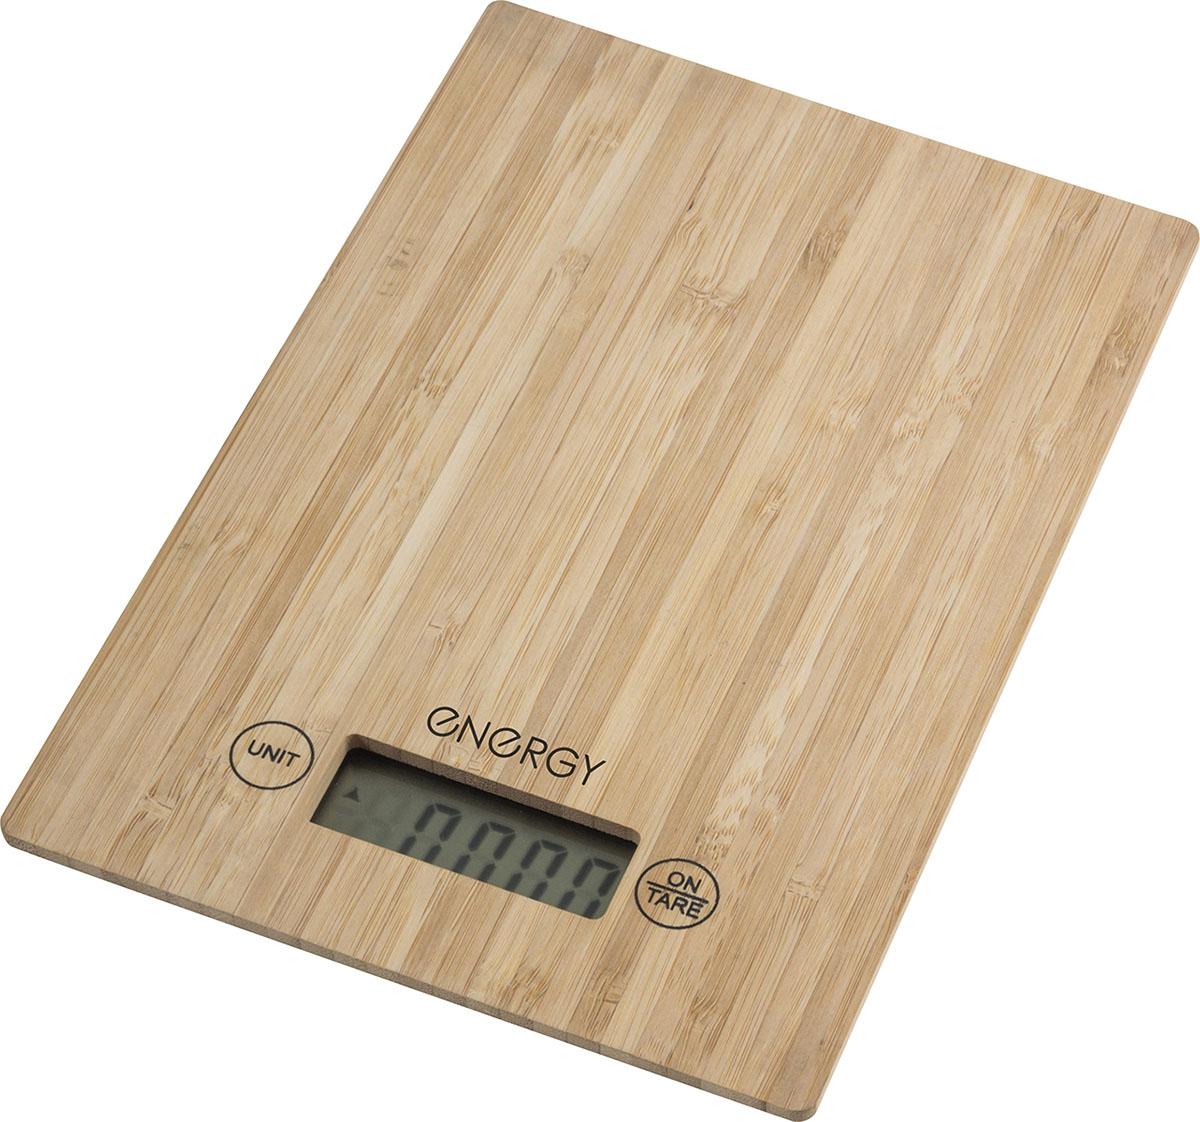 Energy EN-426 кухонные весы energy весы напольные механические enм 408b energy